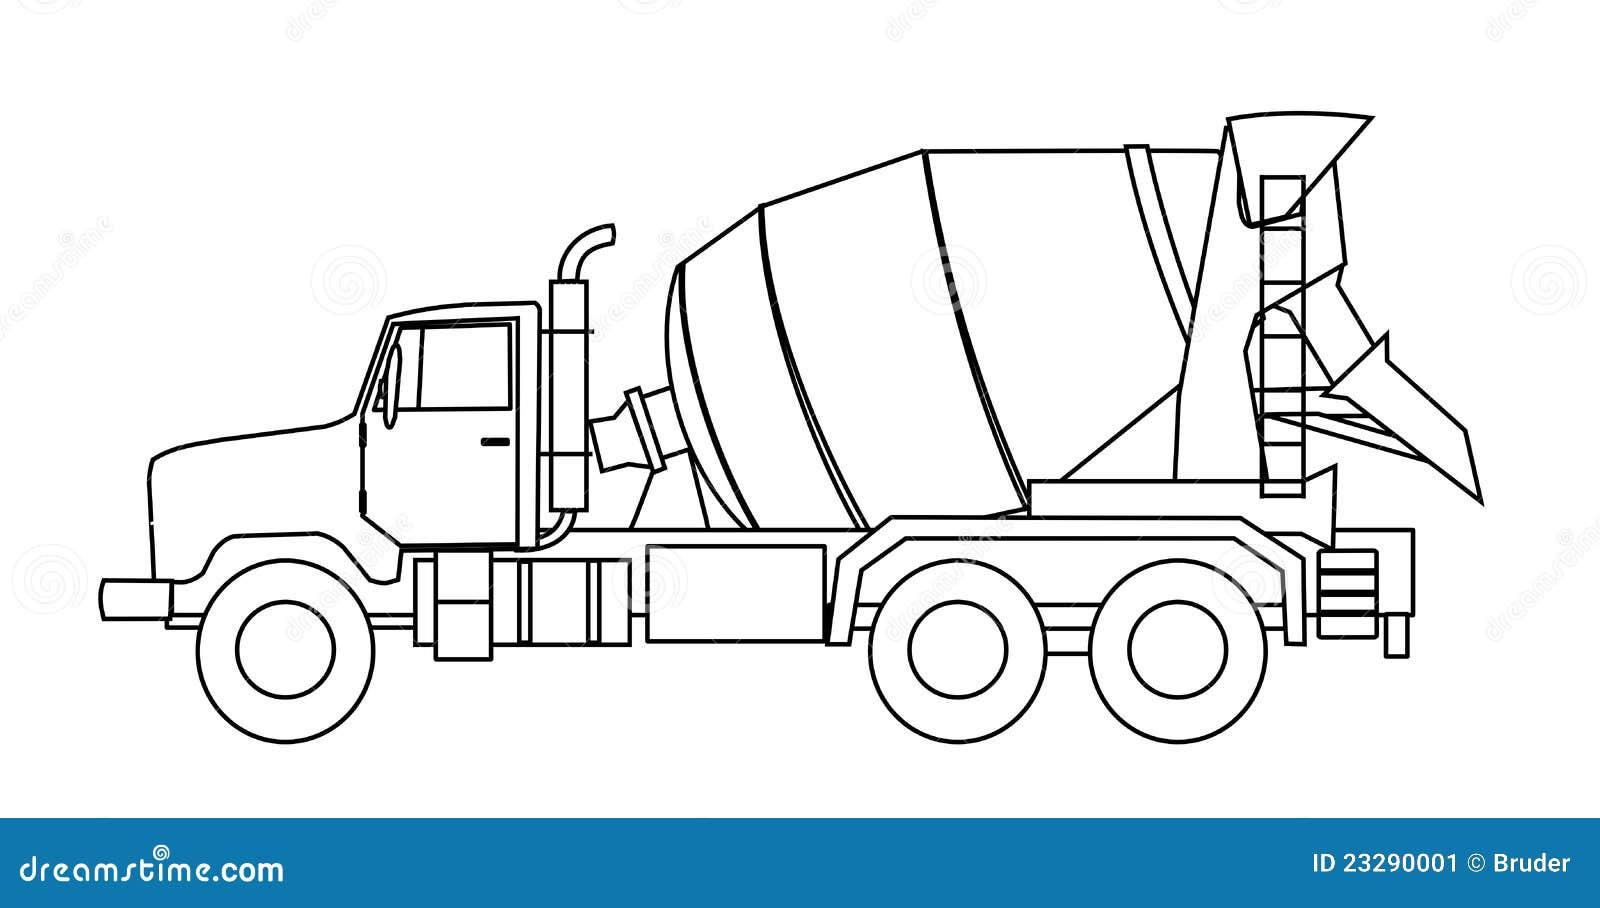 Masonry Business Clip Art : Cement mixer truck stock image